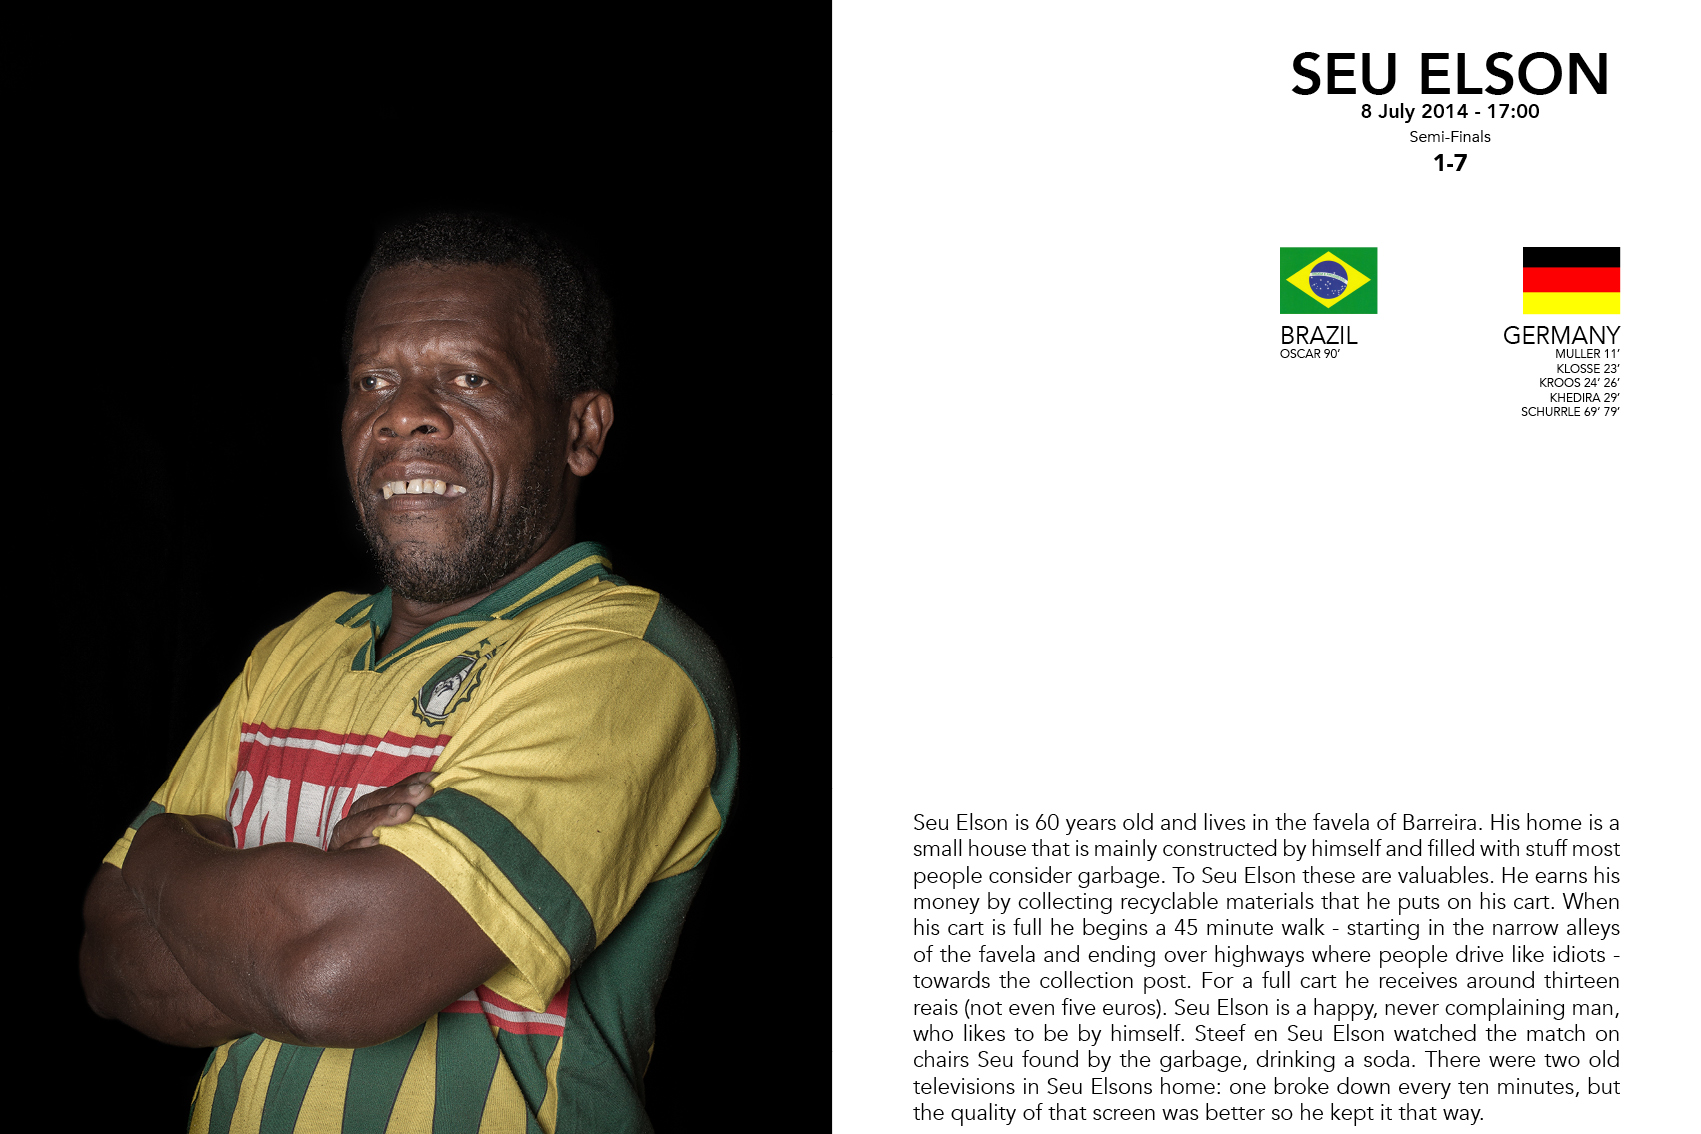 THE OTHER SELEÇãO Pages7.jpg